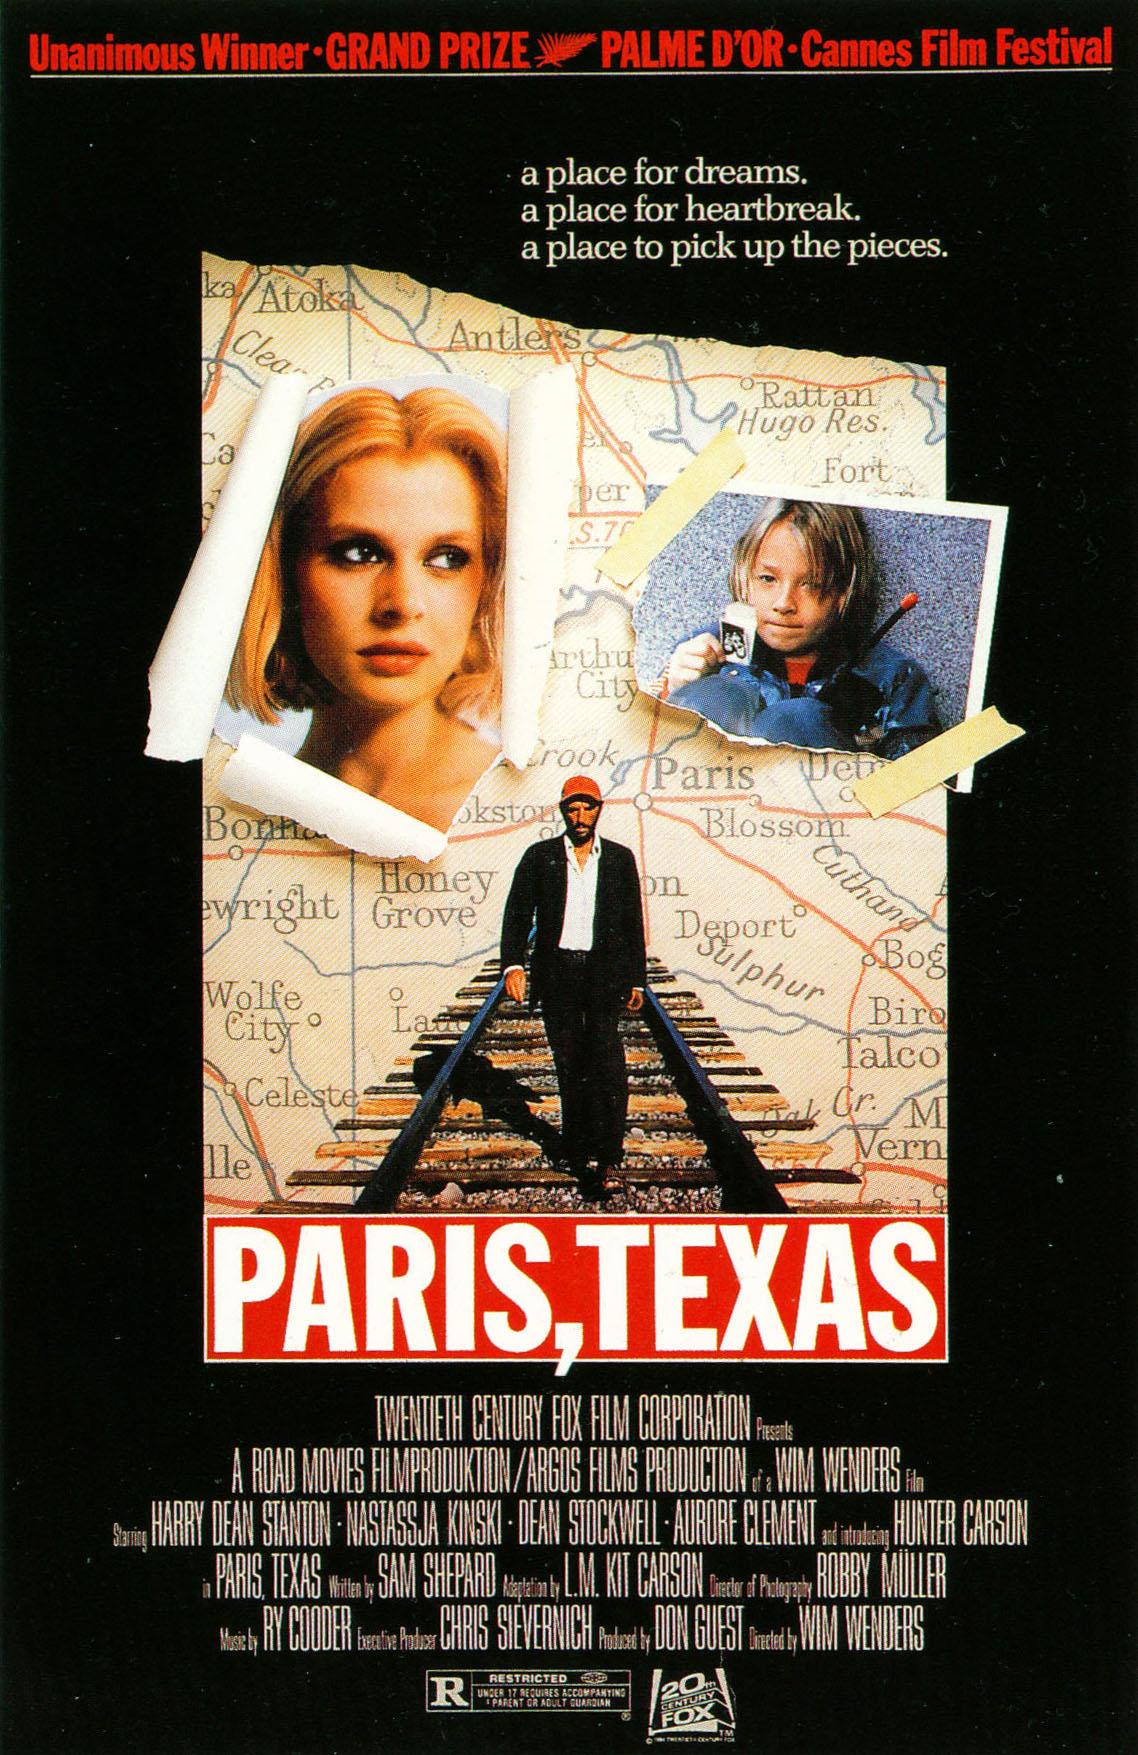 Paris, Texas (1984) - Directed By:Wim WendersStarring: Harry Dean Stanton, Nastassja Kinski, Dean StockwellRated: RRun Time: 2h 25mTMM Score: 5 StarsStrengths: Acting, Creation of Emotional SpaceWeakness: Length, Pacing